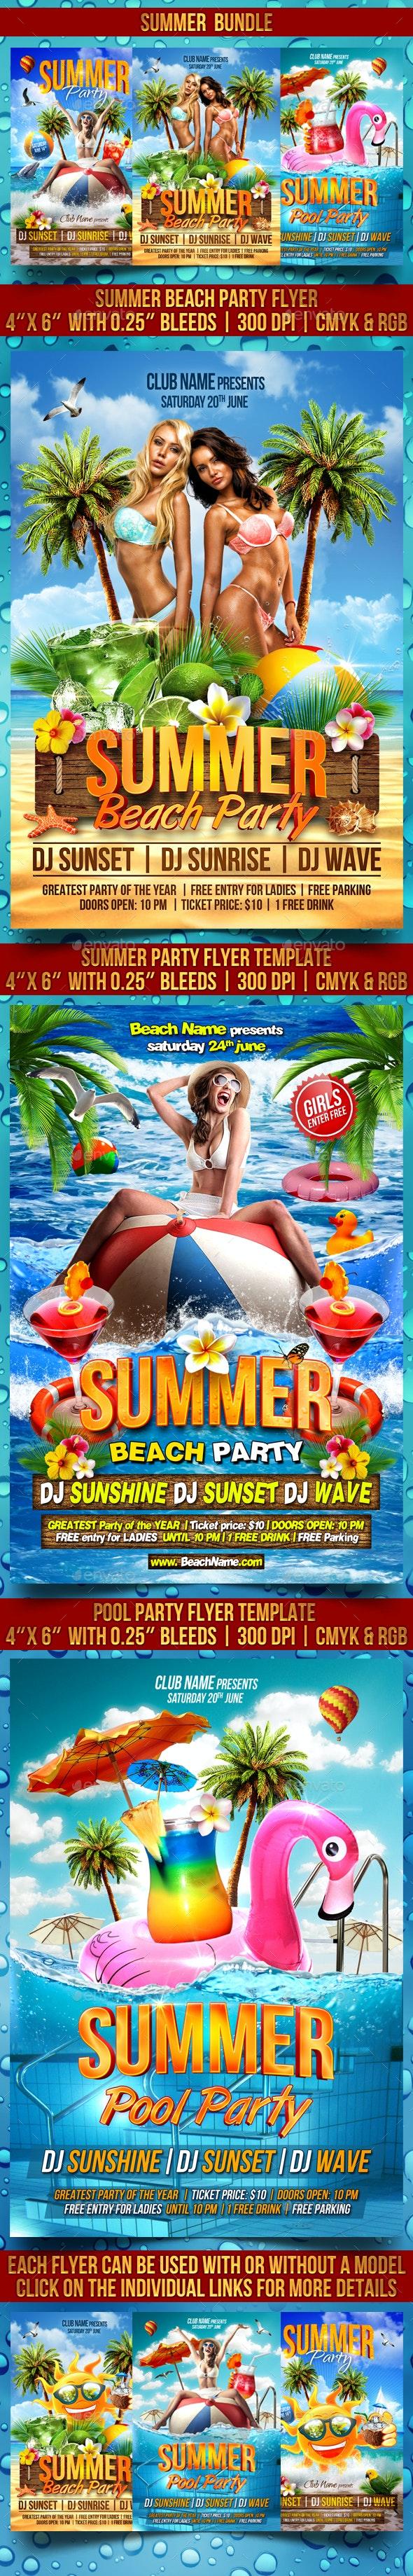 Summer Flyer Bundle V2 - Clubs & Parties Events